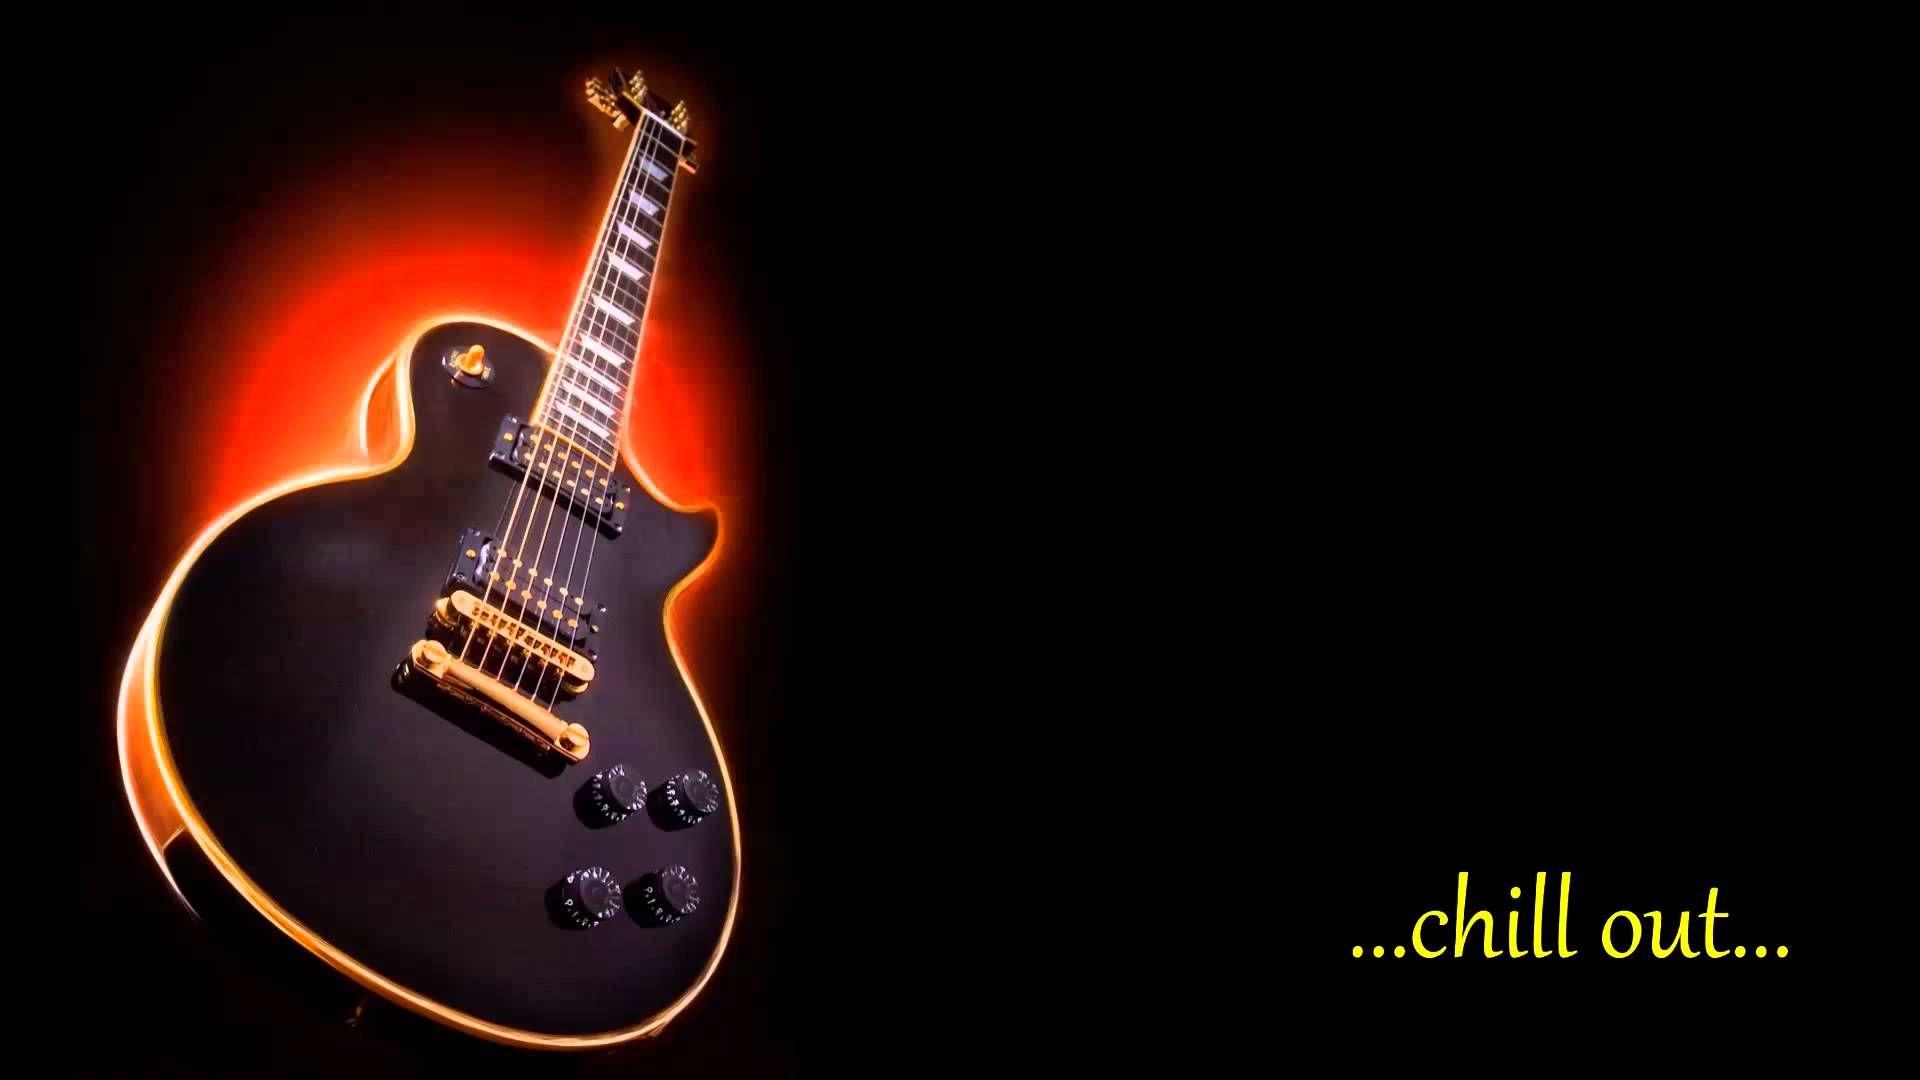 Santana - Smooth (lyrics) HD Published on May 20, 2013